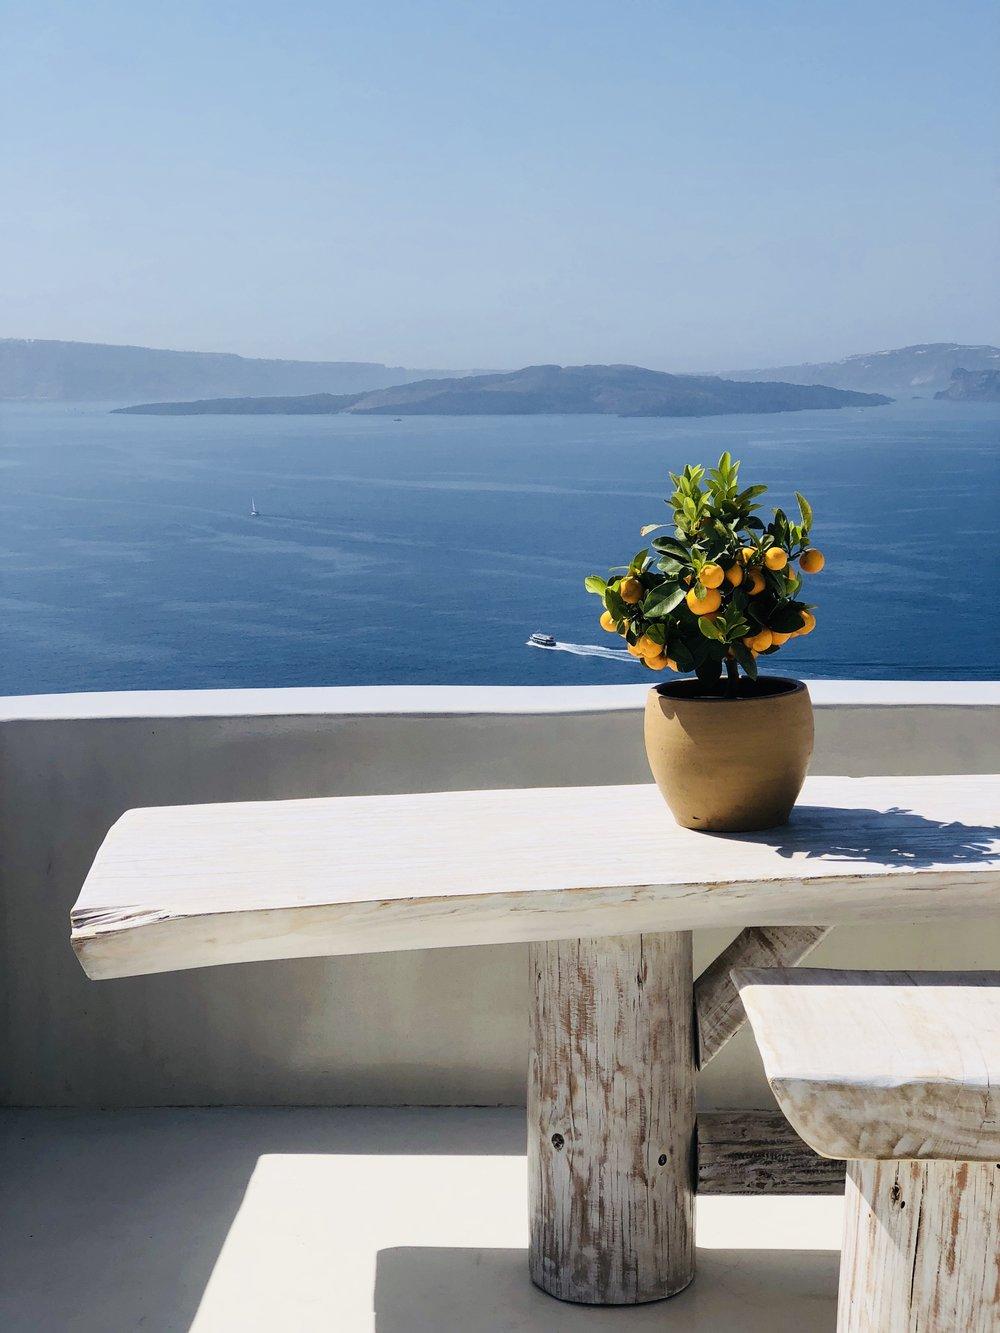 Oia Santorini Luxury Hotel // Eclectic Prodigy